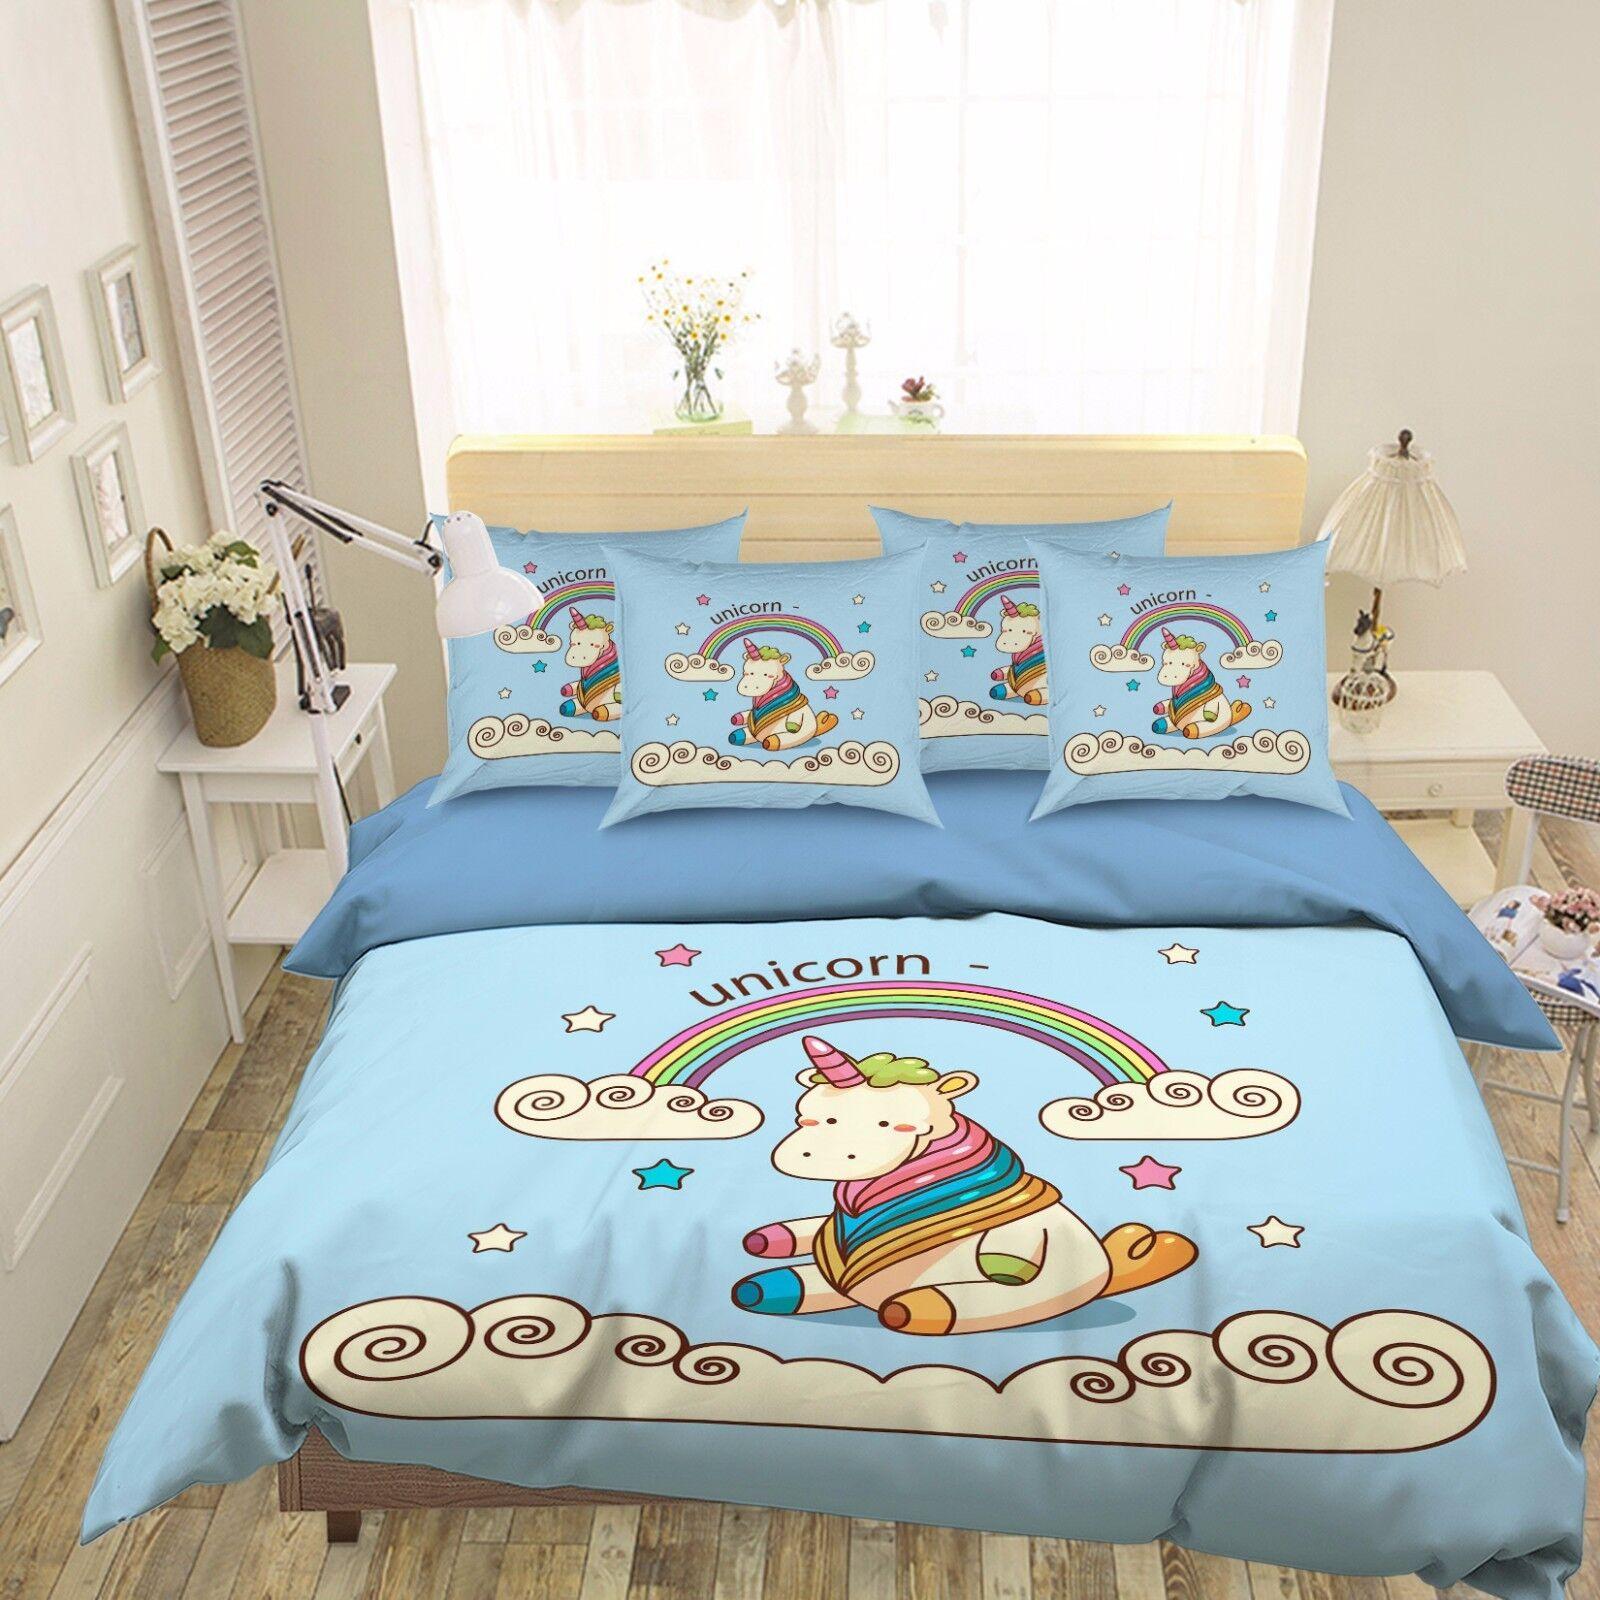 3D Rainbow Unicorn 462 Bed Pillowcases Quilt Duvet Cover Set Single Queen CA